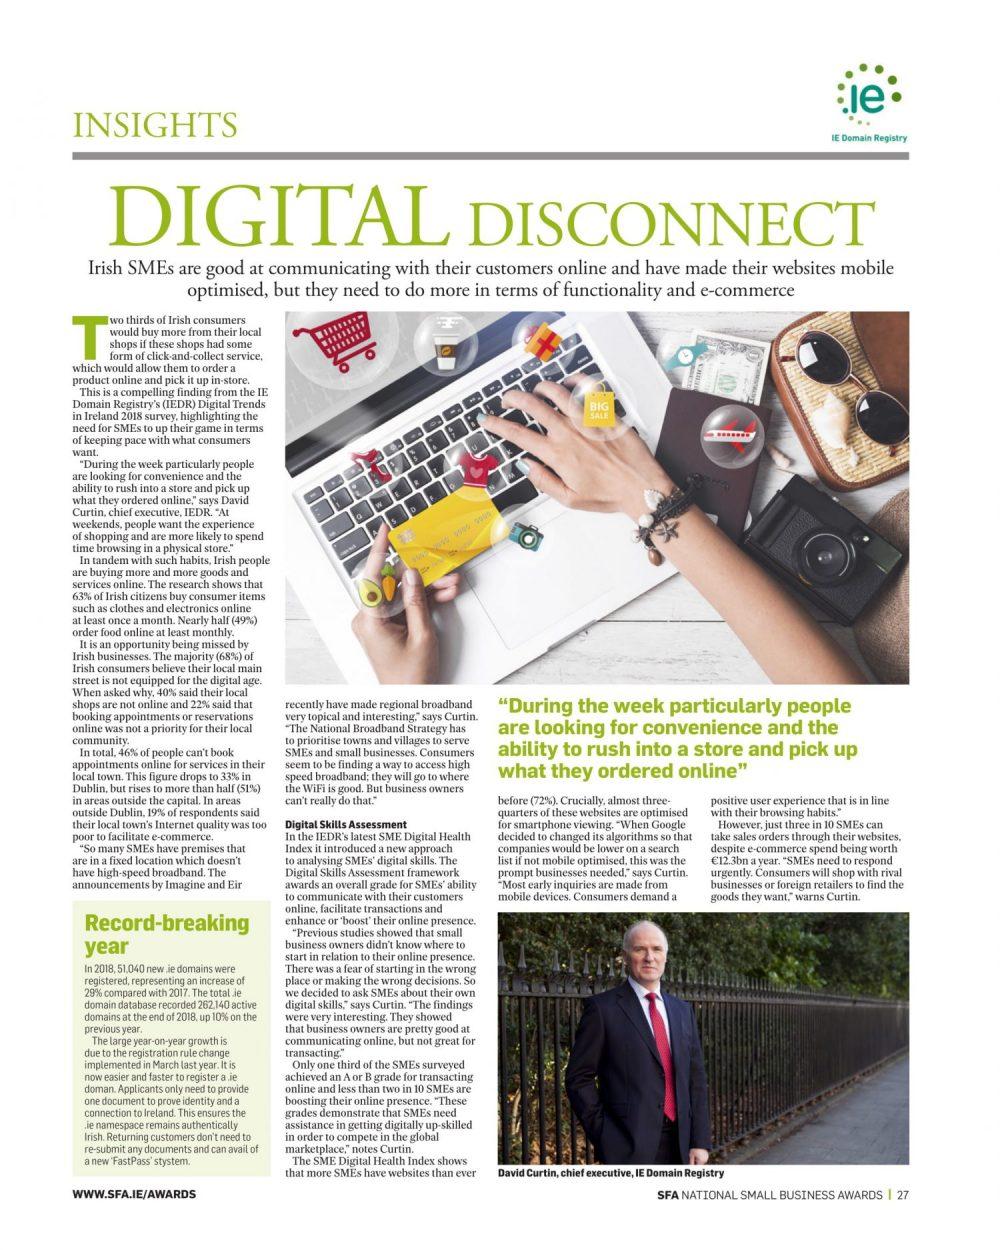 David Curtin Digital Disconnect article